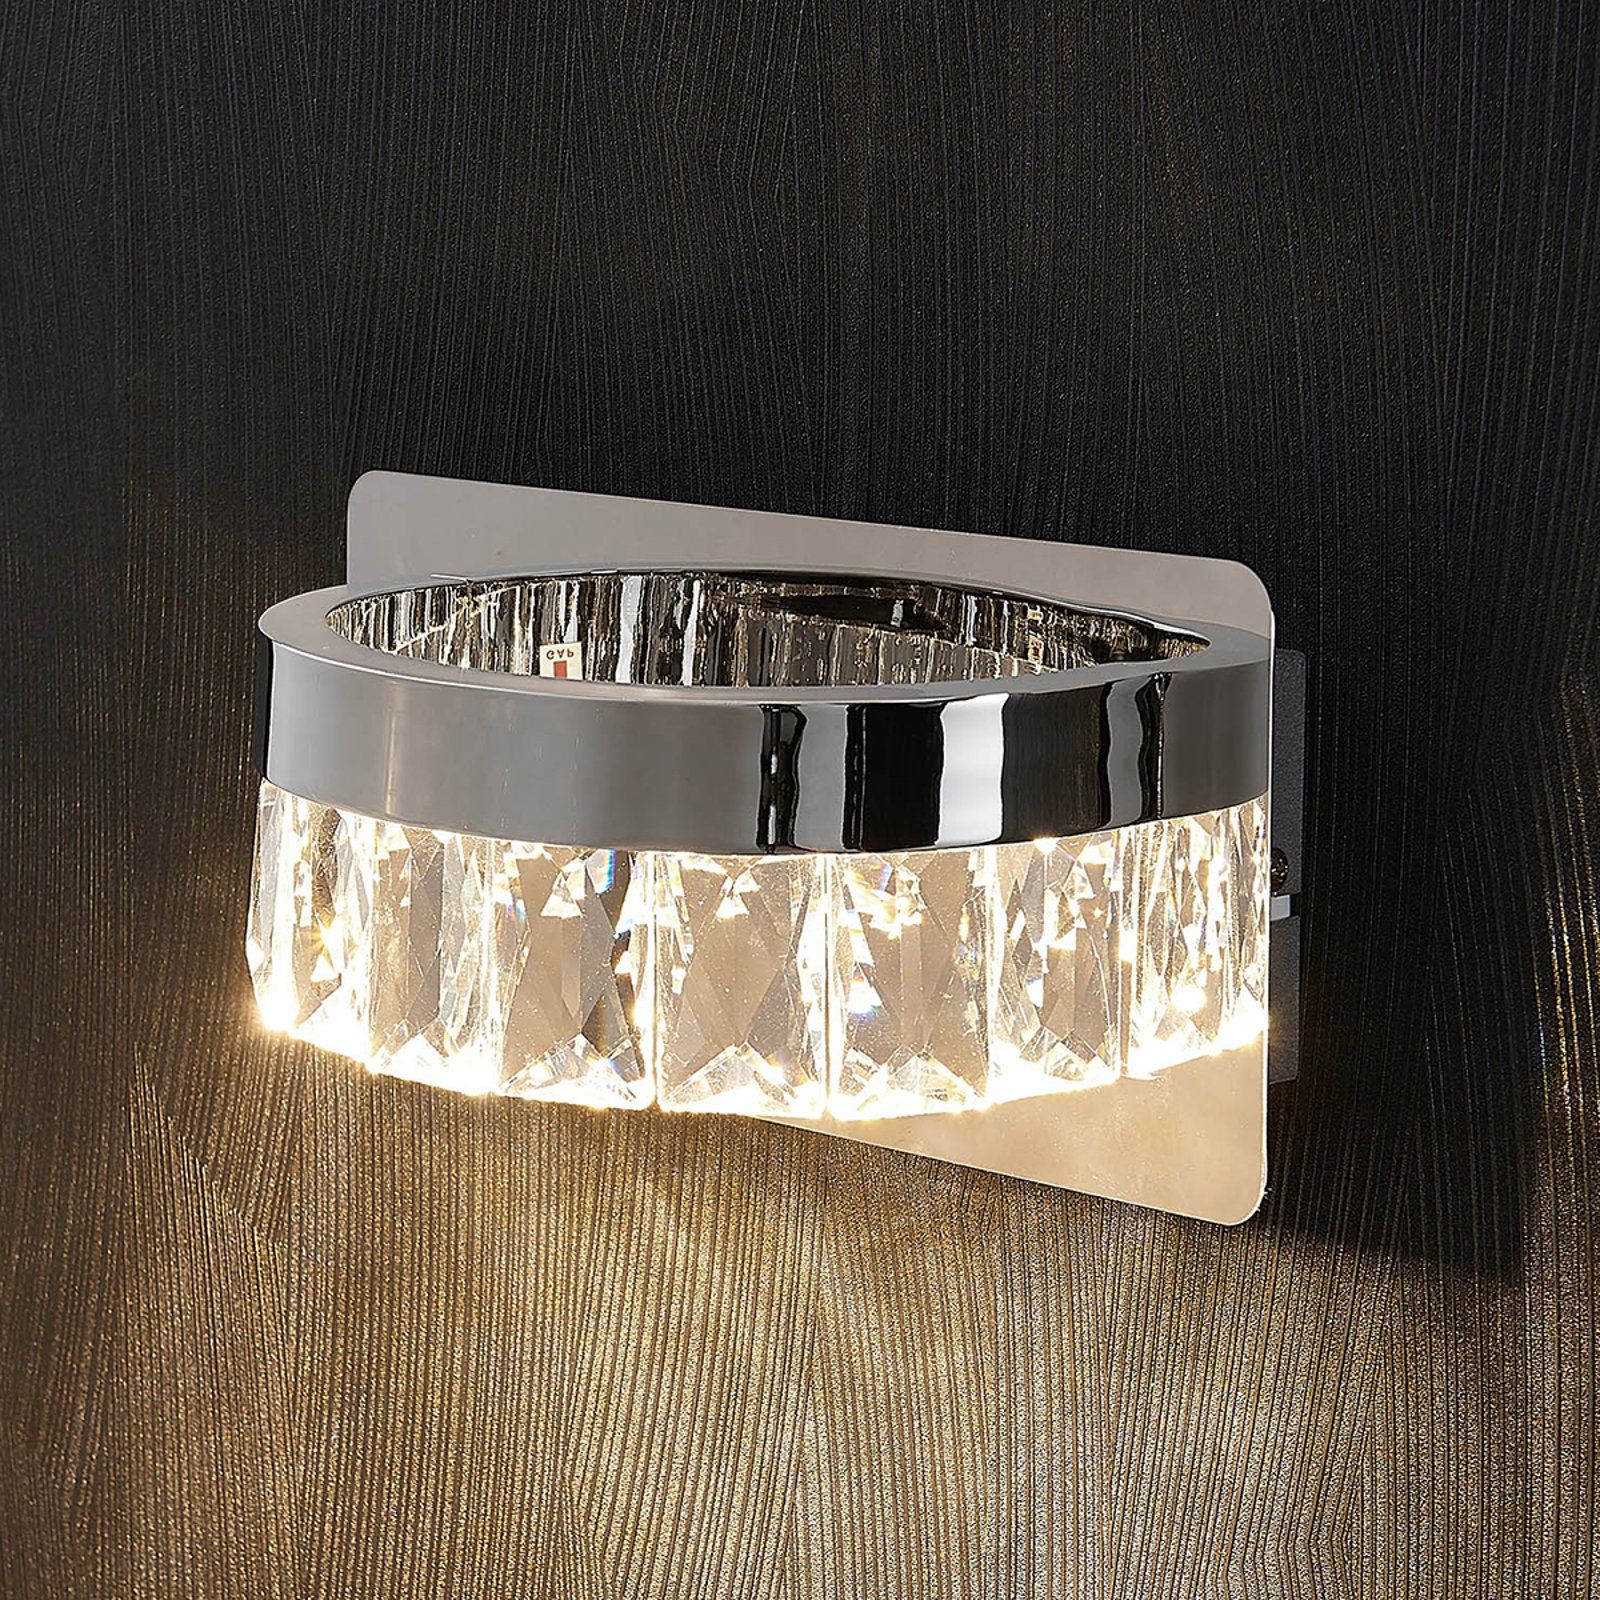 Forkrommet LED-vegglampe Sula i krystall